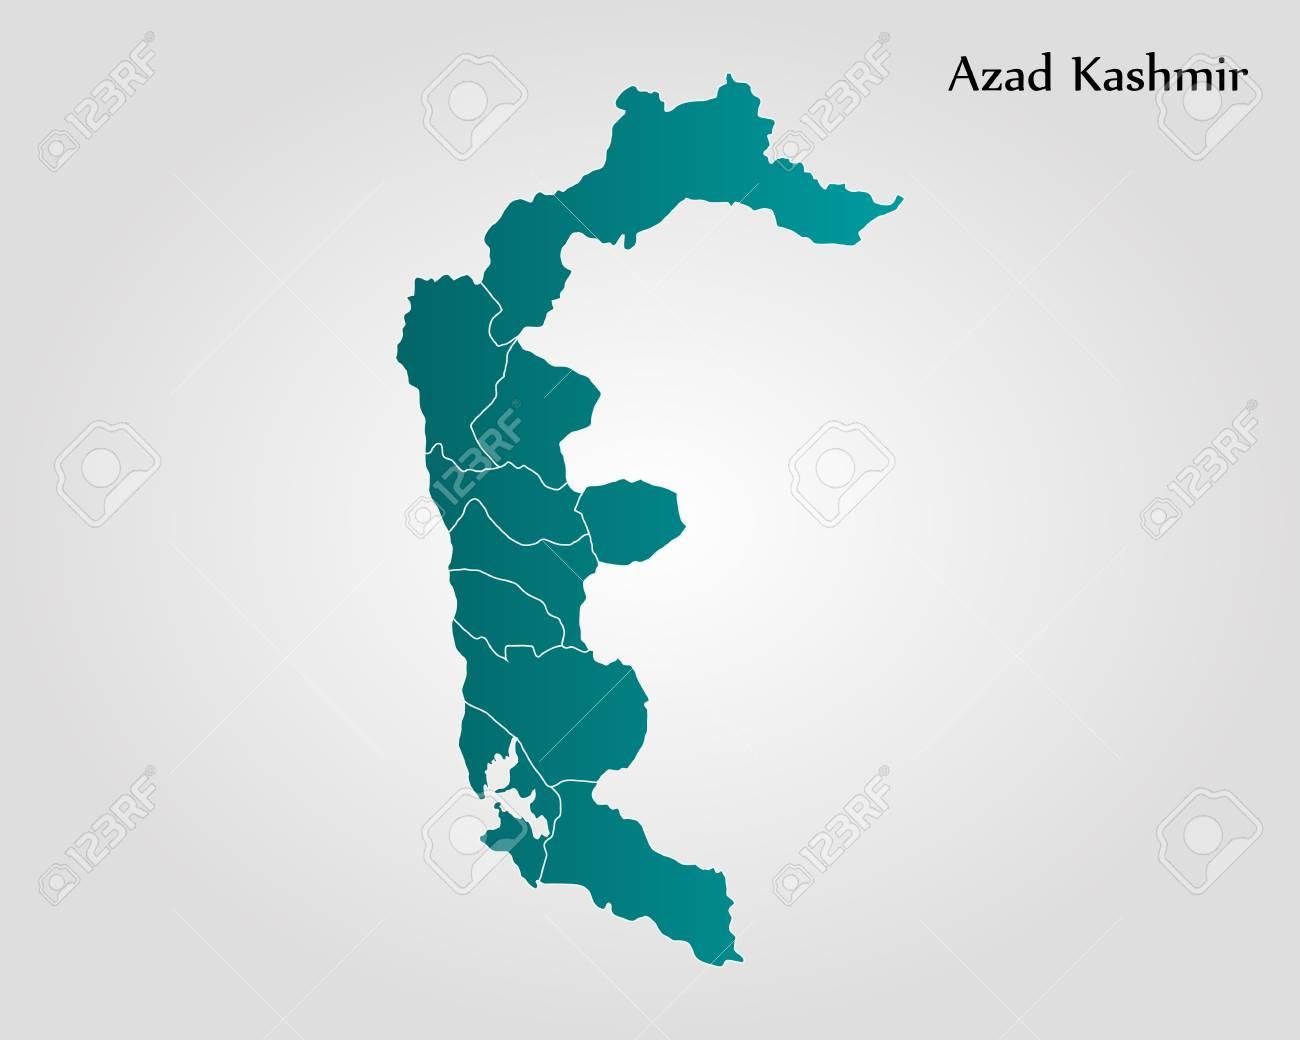 Kashmir On World Map.Map Of Azad Kashmir Vector Illustration World Map Royalty Free